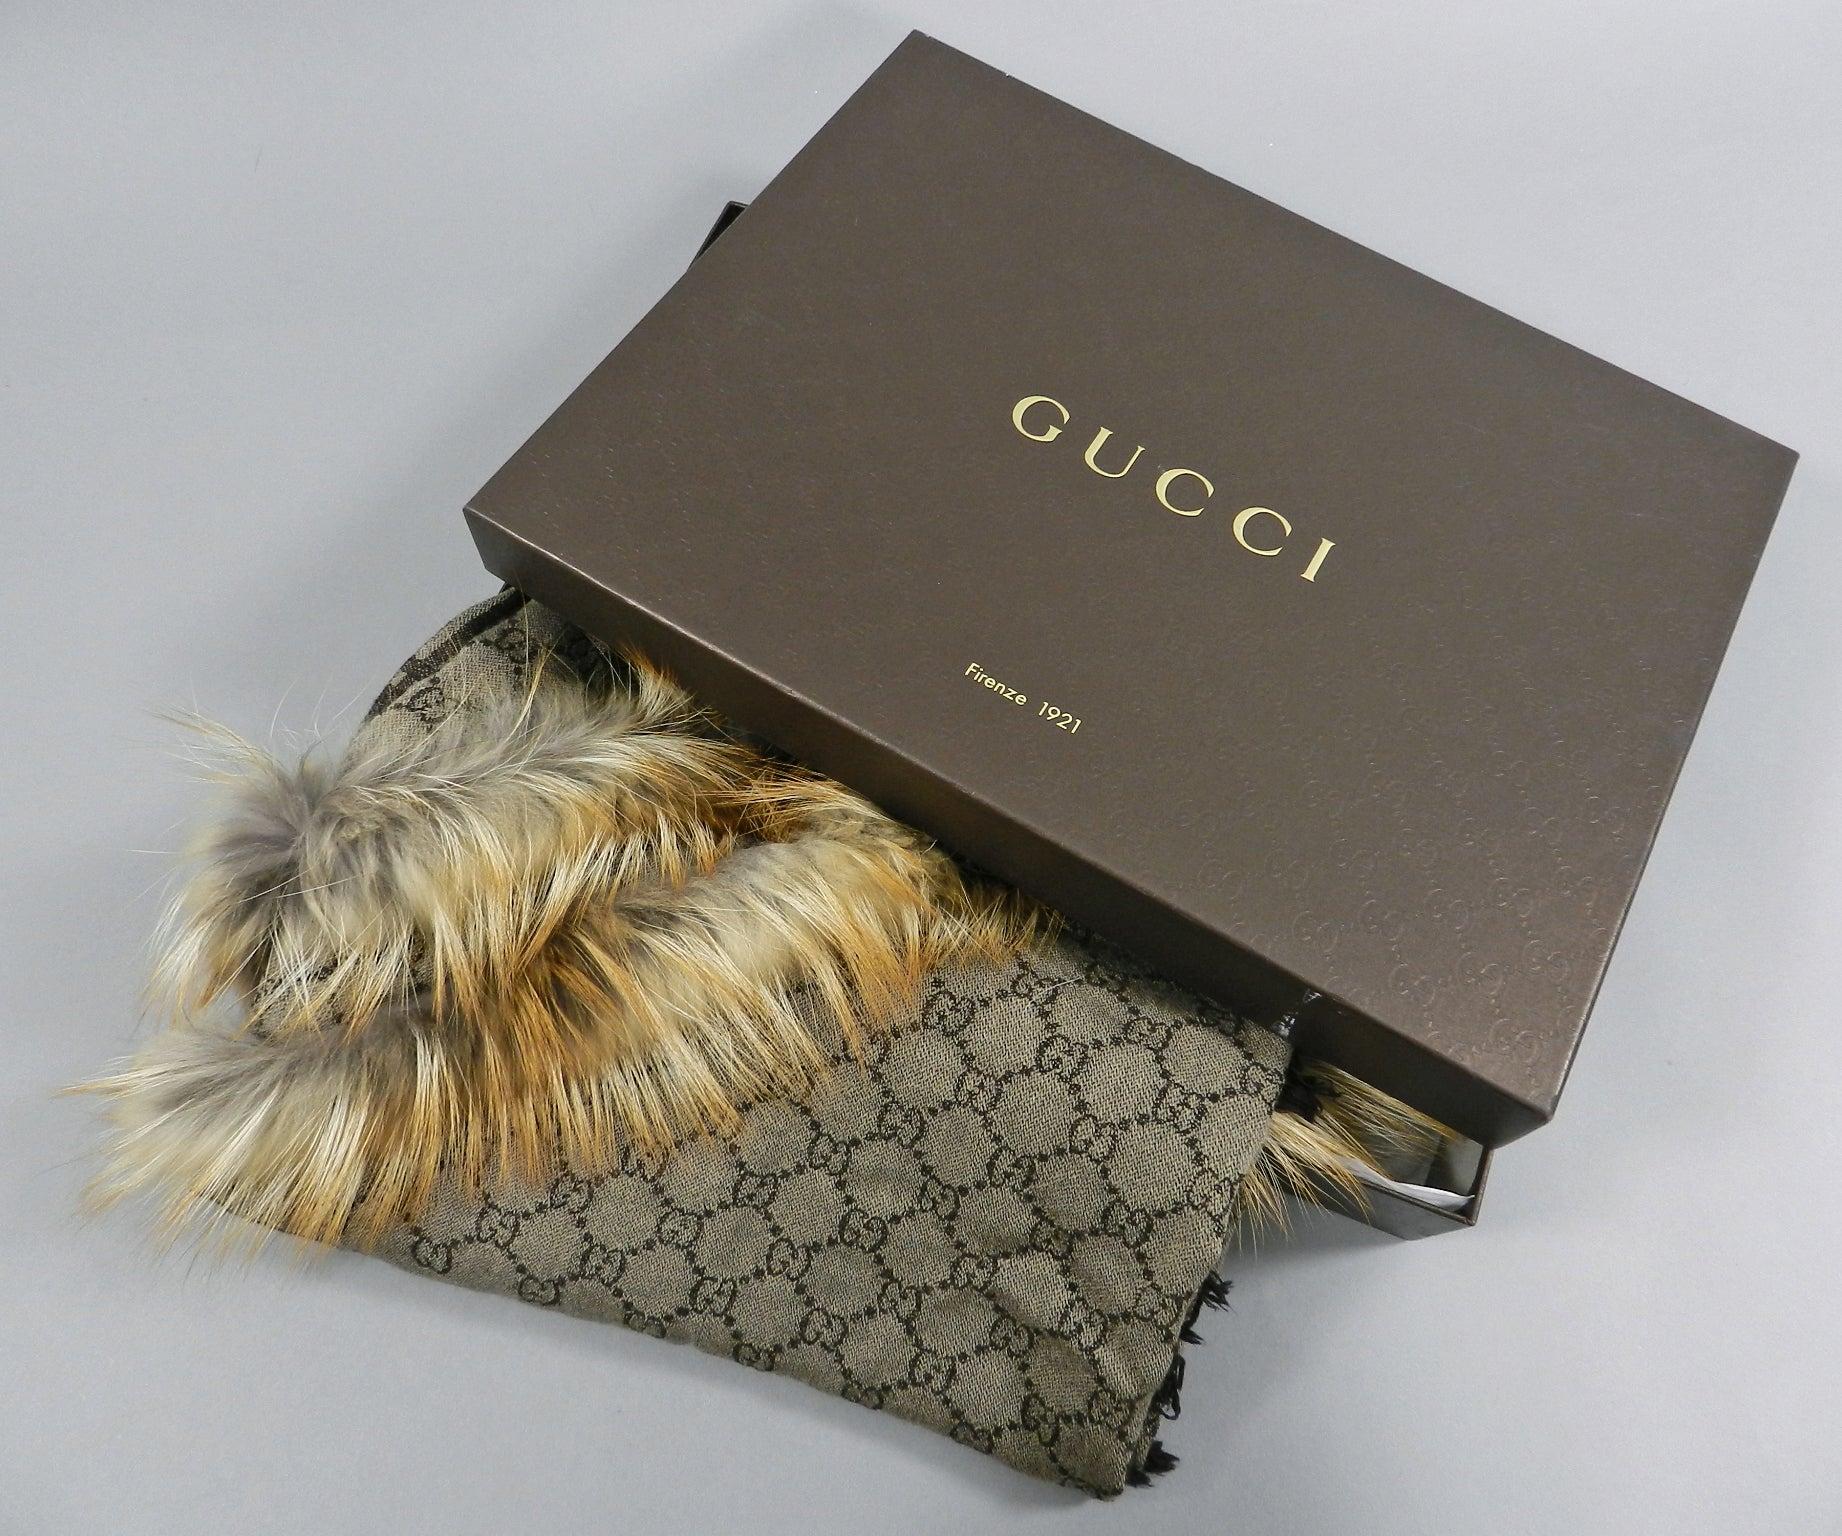 def8db1dc981 Gucci Brown GG Logo Large Shawl Wrap with Fox Fur Trim at 1stdibs